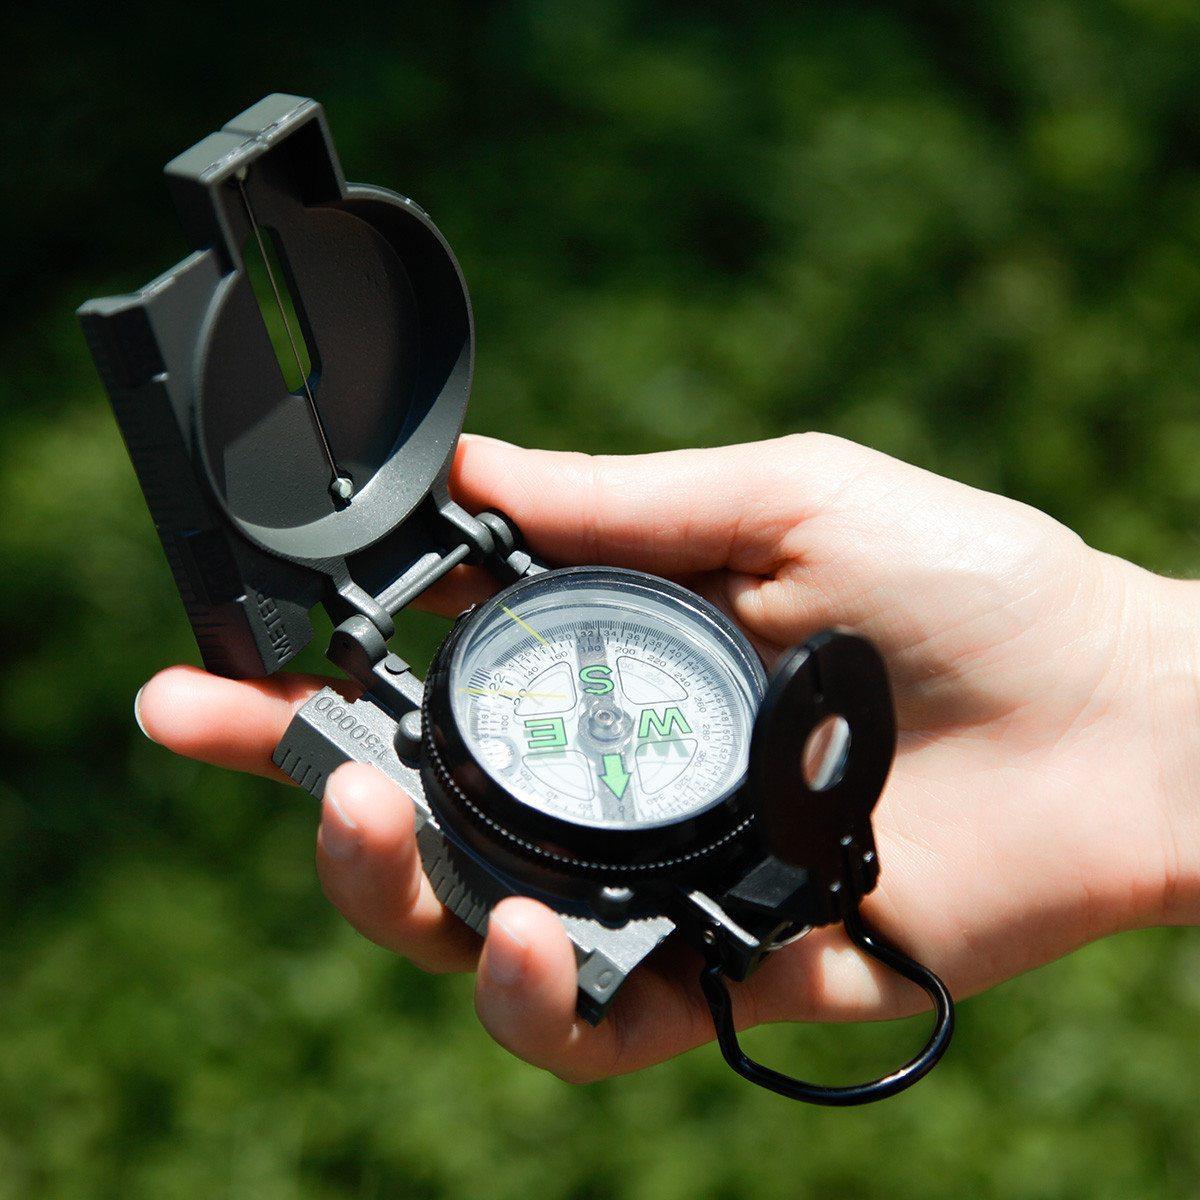 Praktischer Kompass